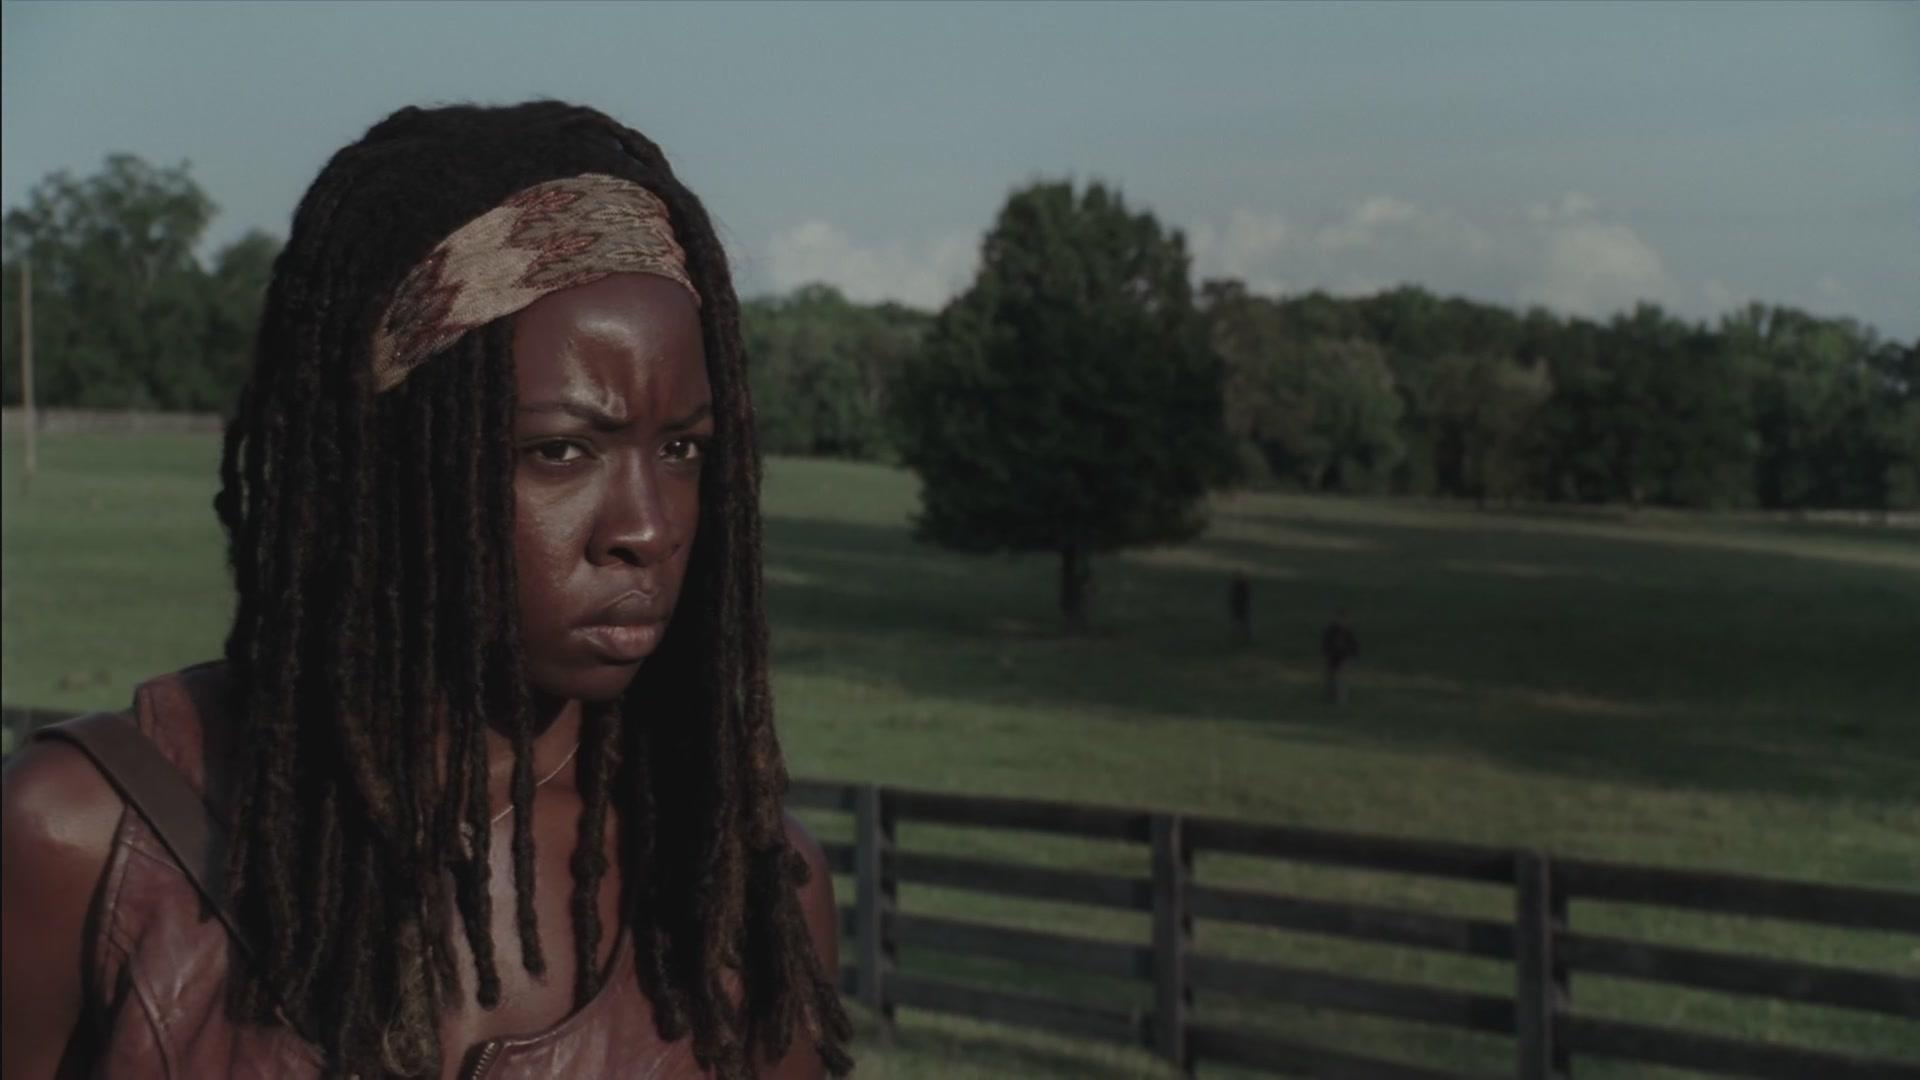 'The Walking Dead' Season 3 Episode 3 Captures